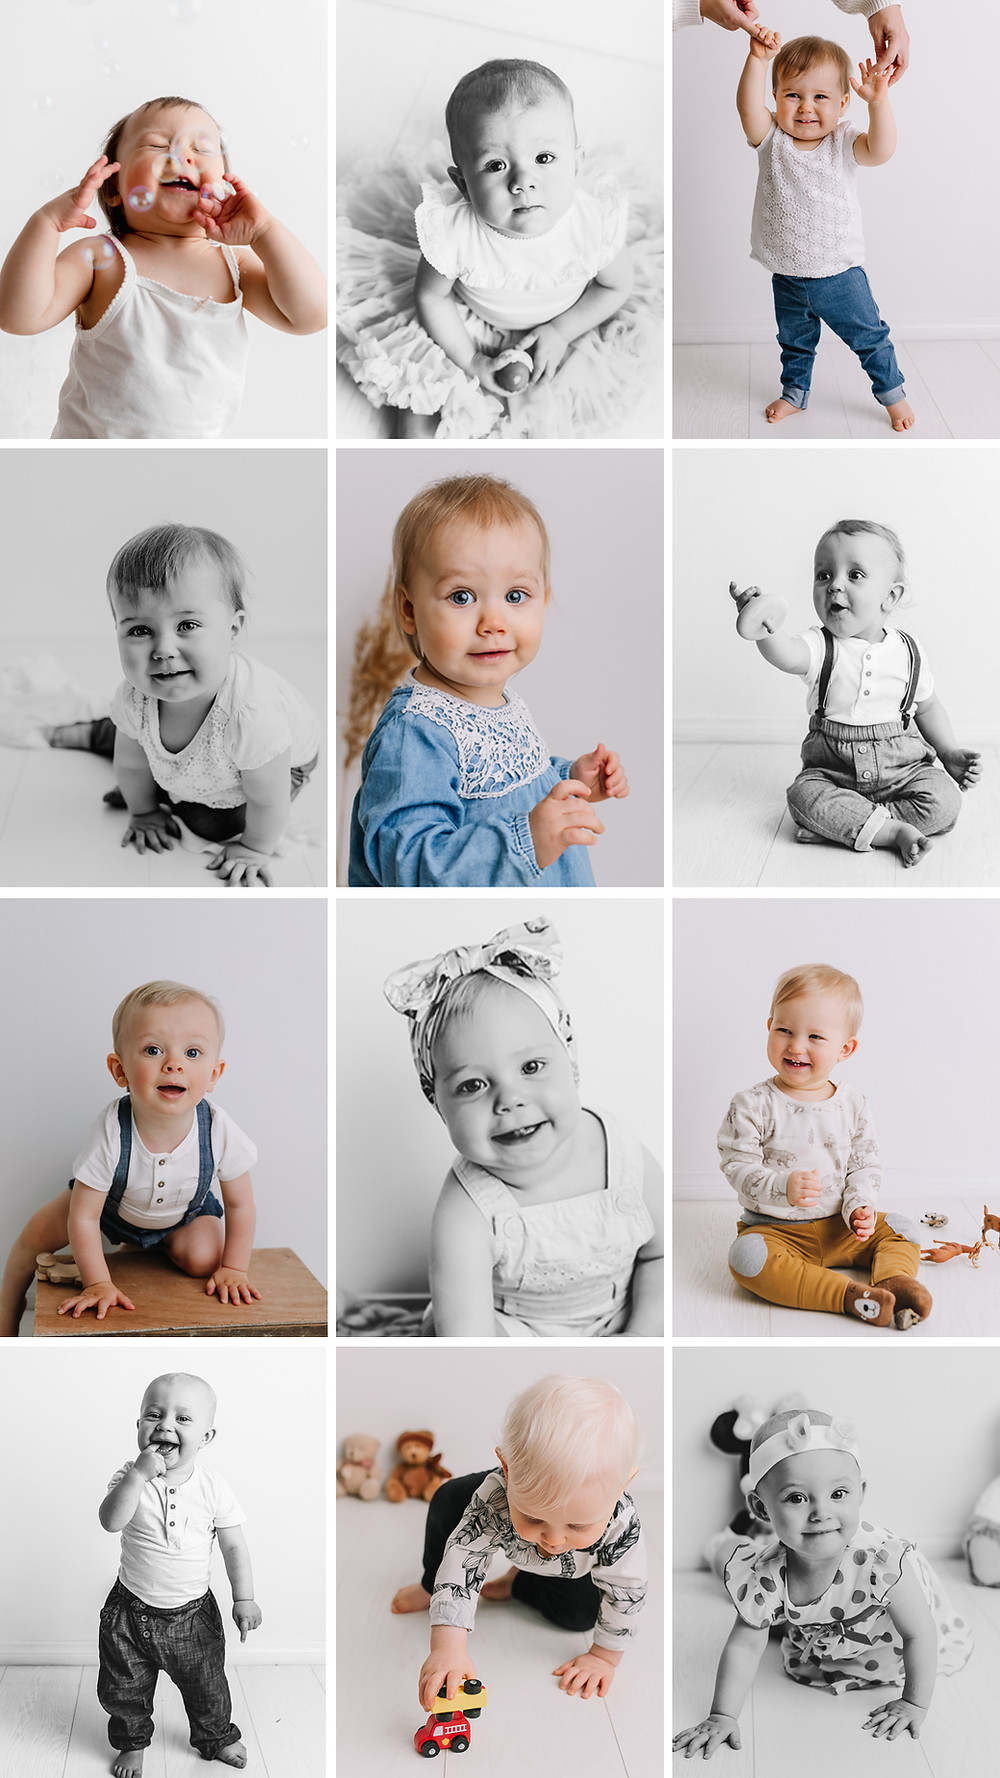 yksivuotiskuvaus minikuvaus lapsikuvaus vauvakuvaus lahti